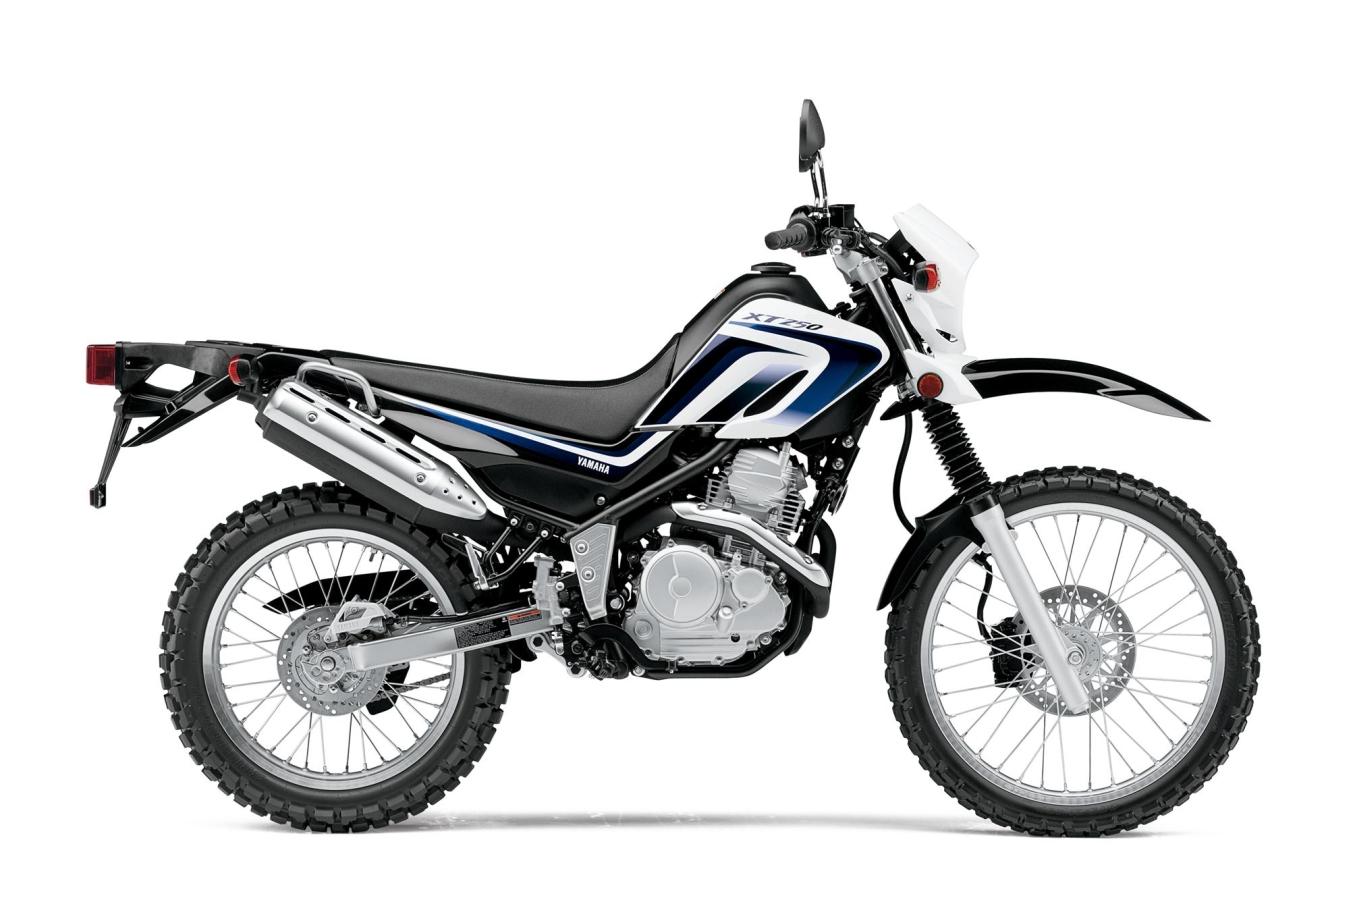 Yamaha Xt250 Finally Gets Fuel Injection